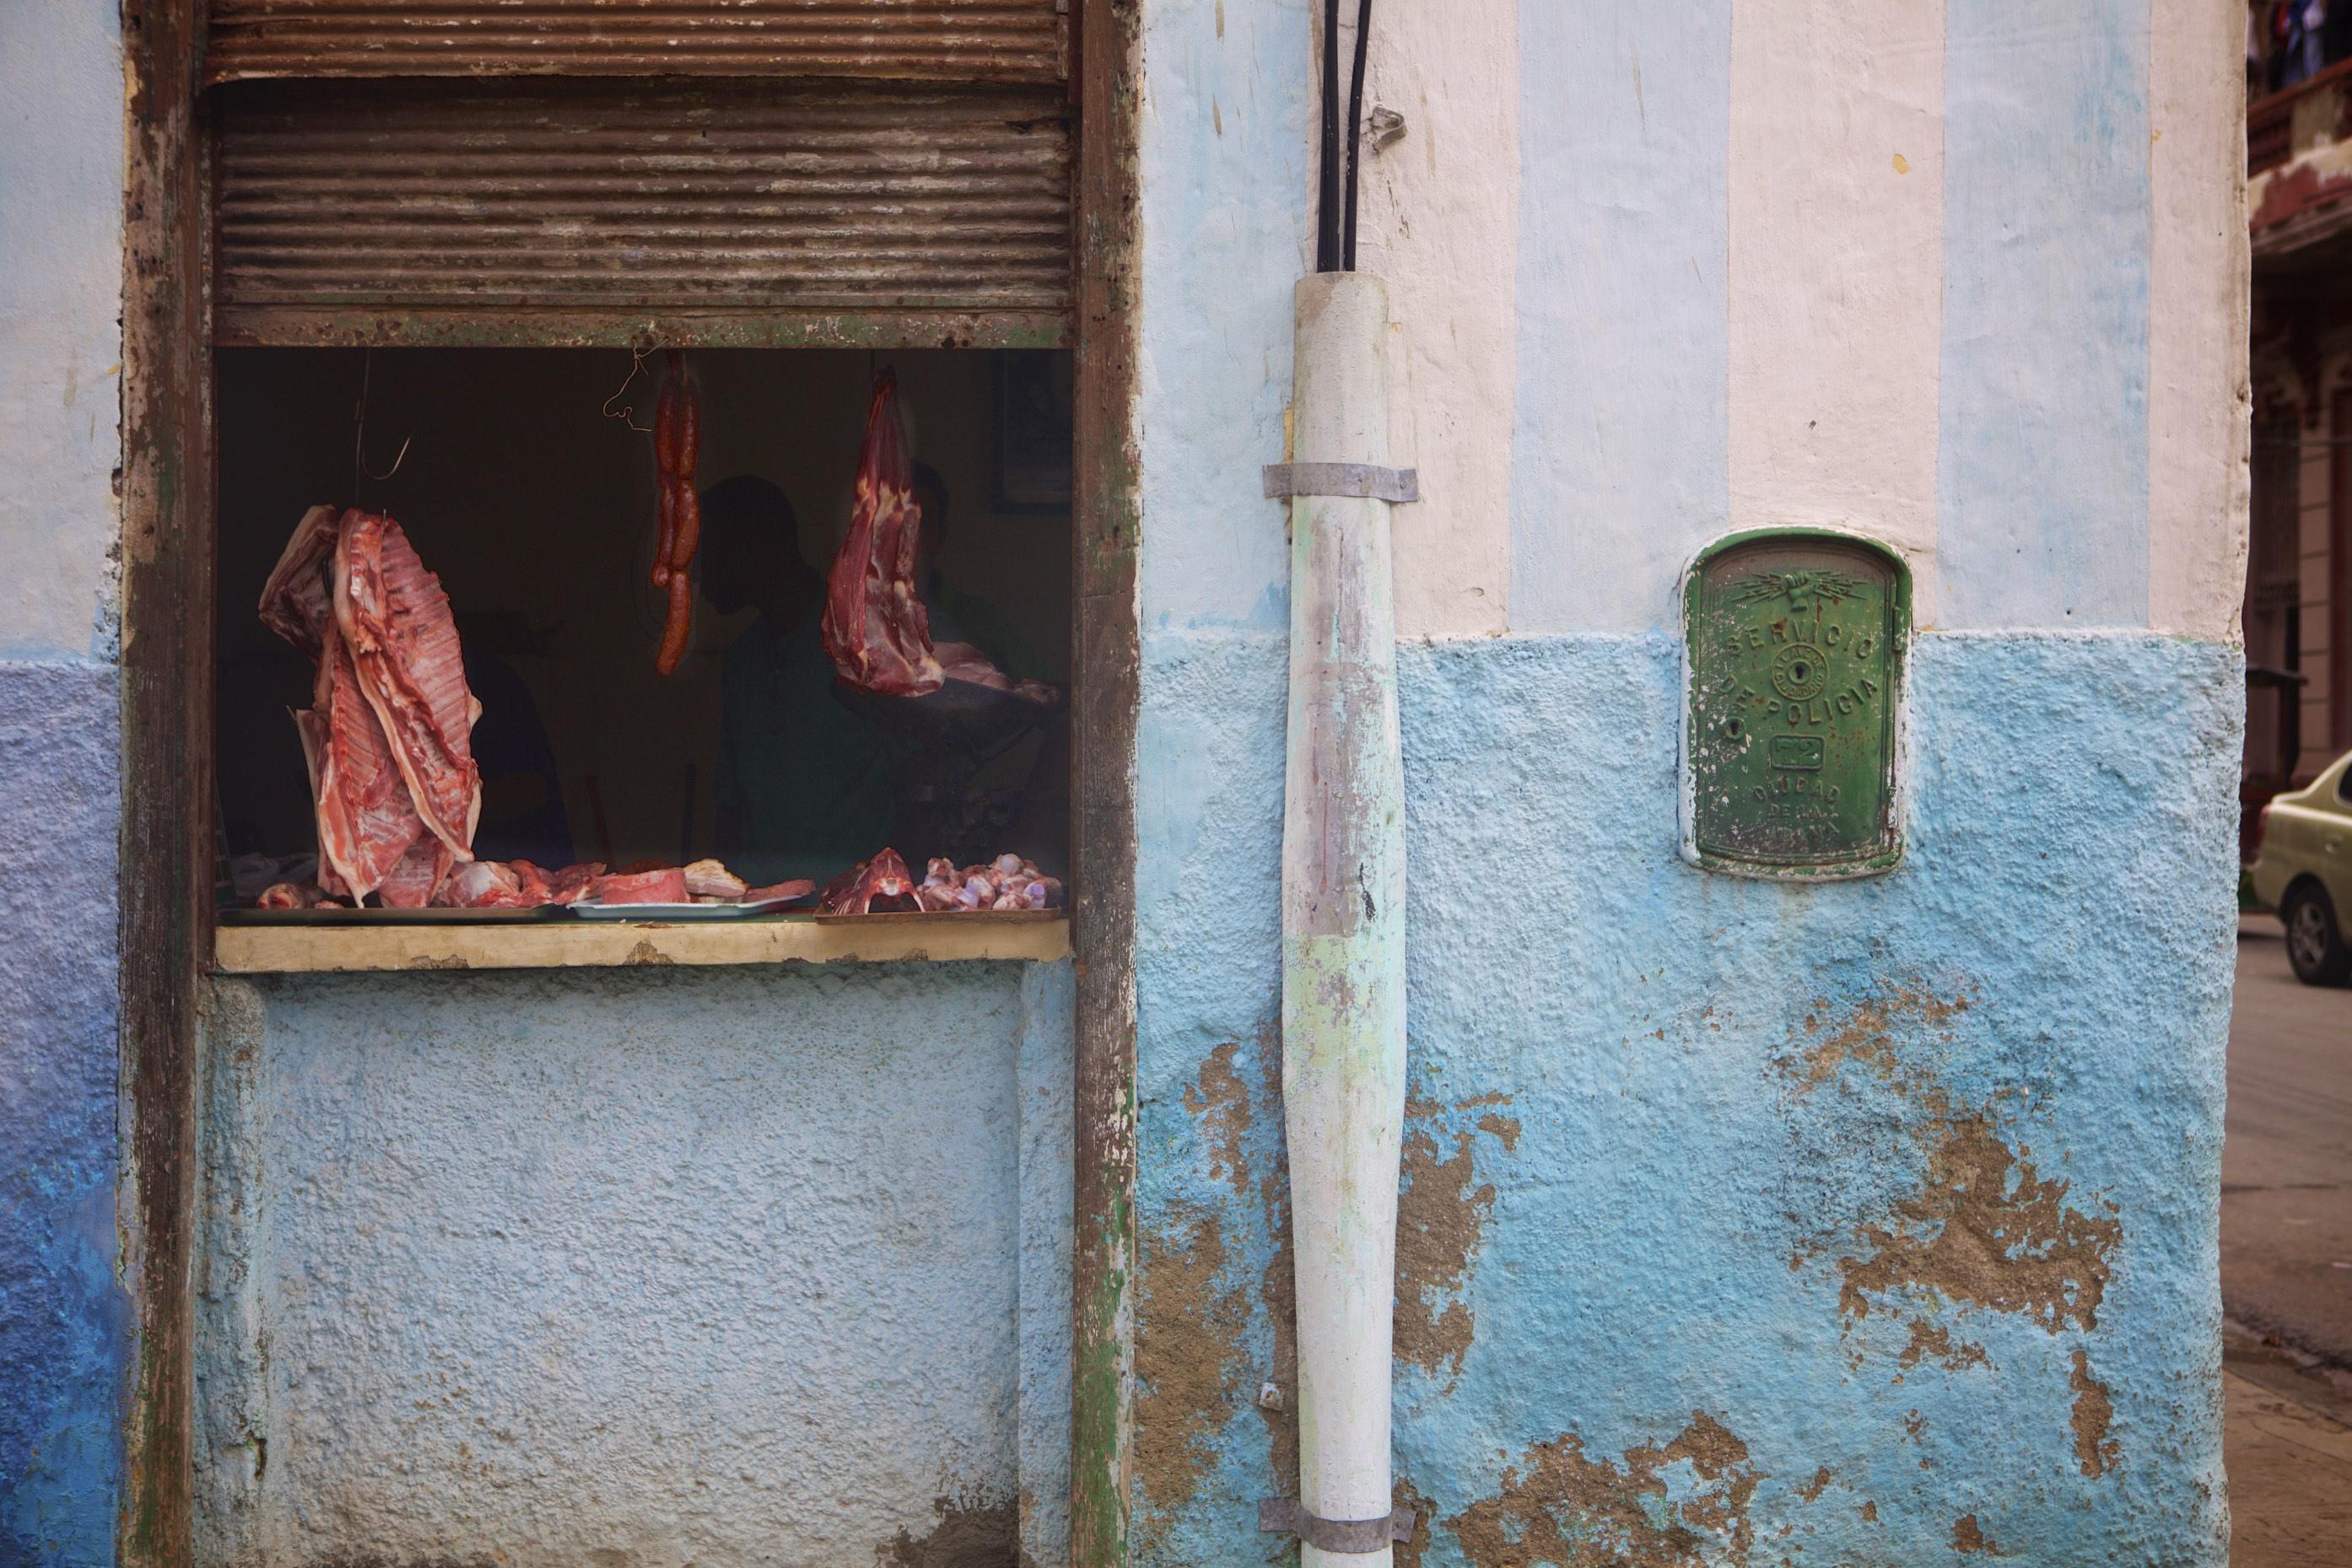 Blue & White Mercado Carne